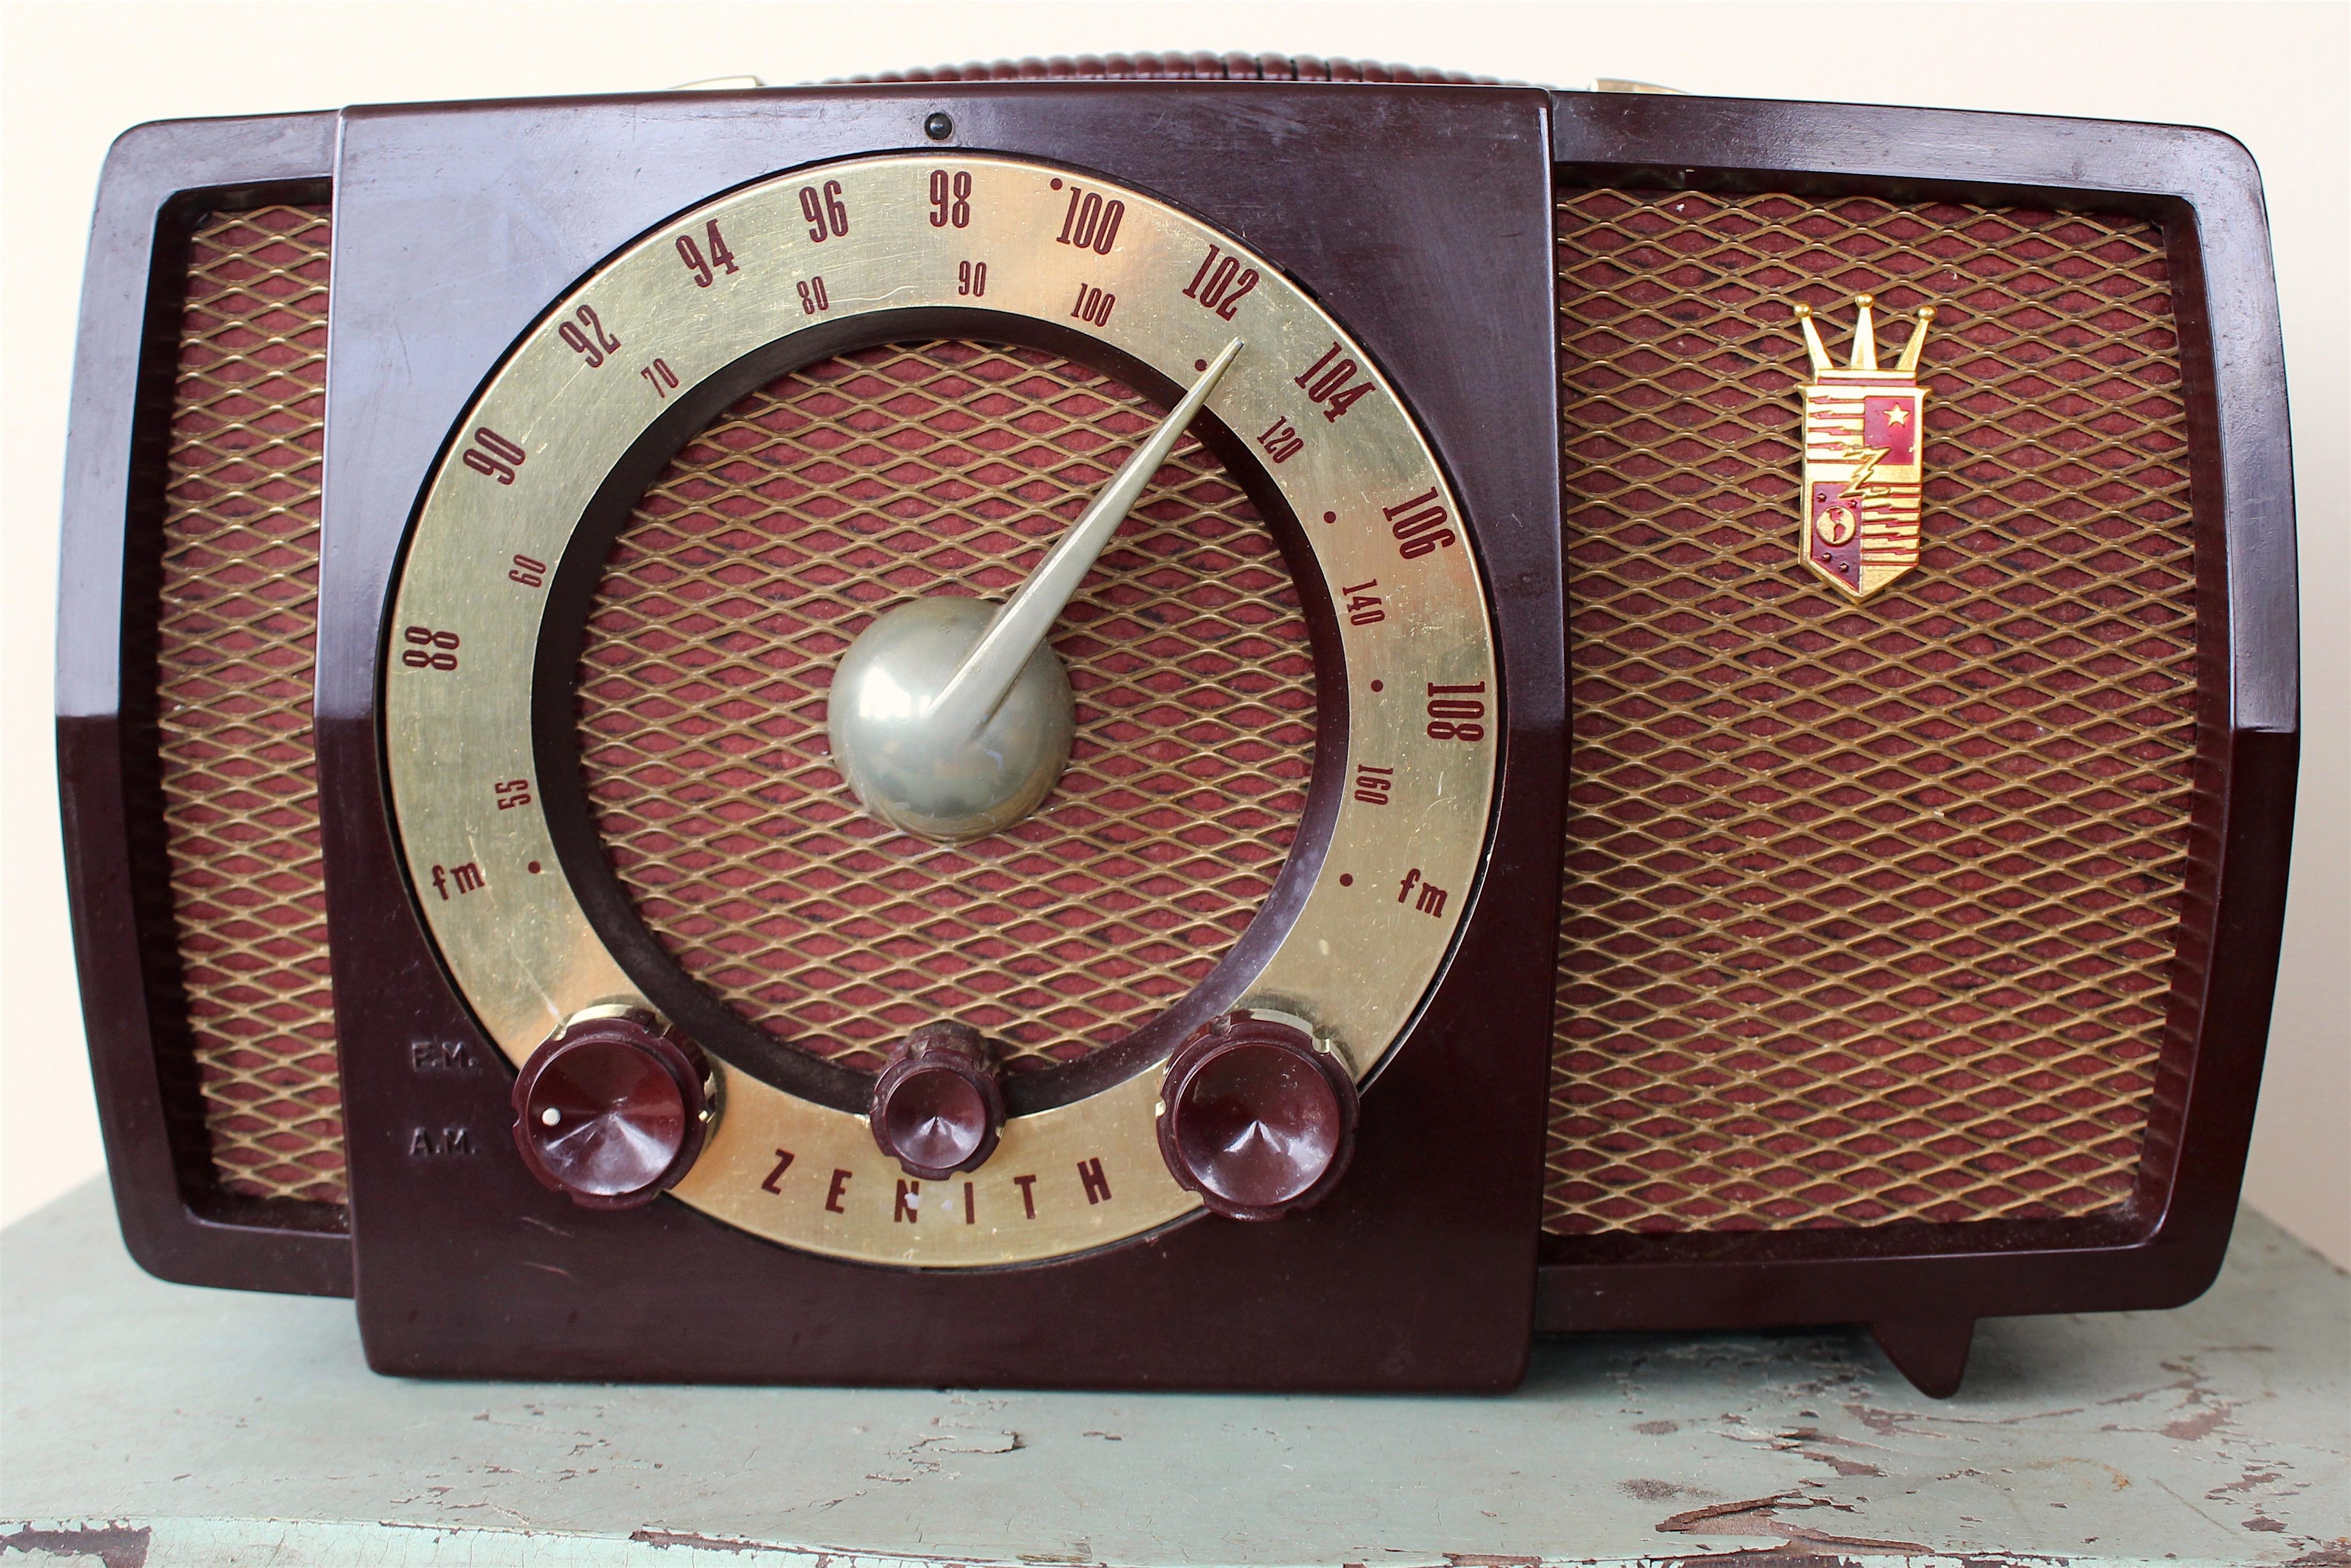 History of the Zenith Radio Corp